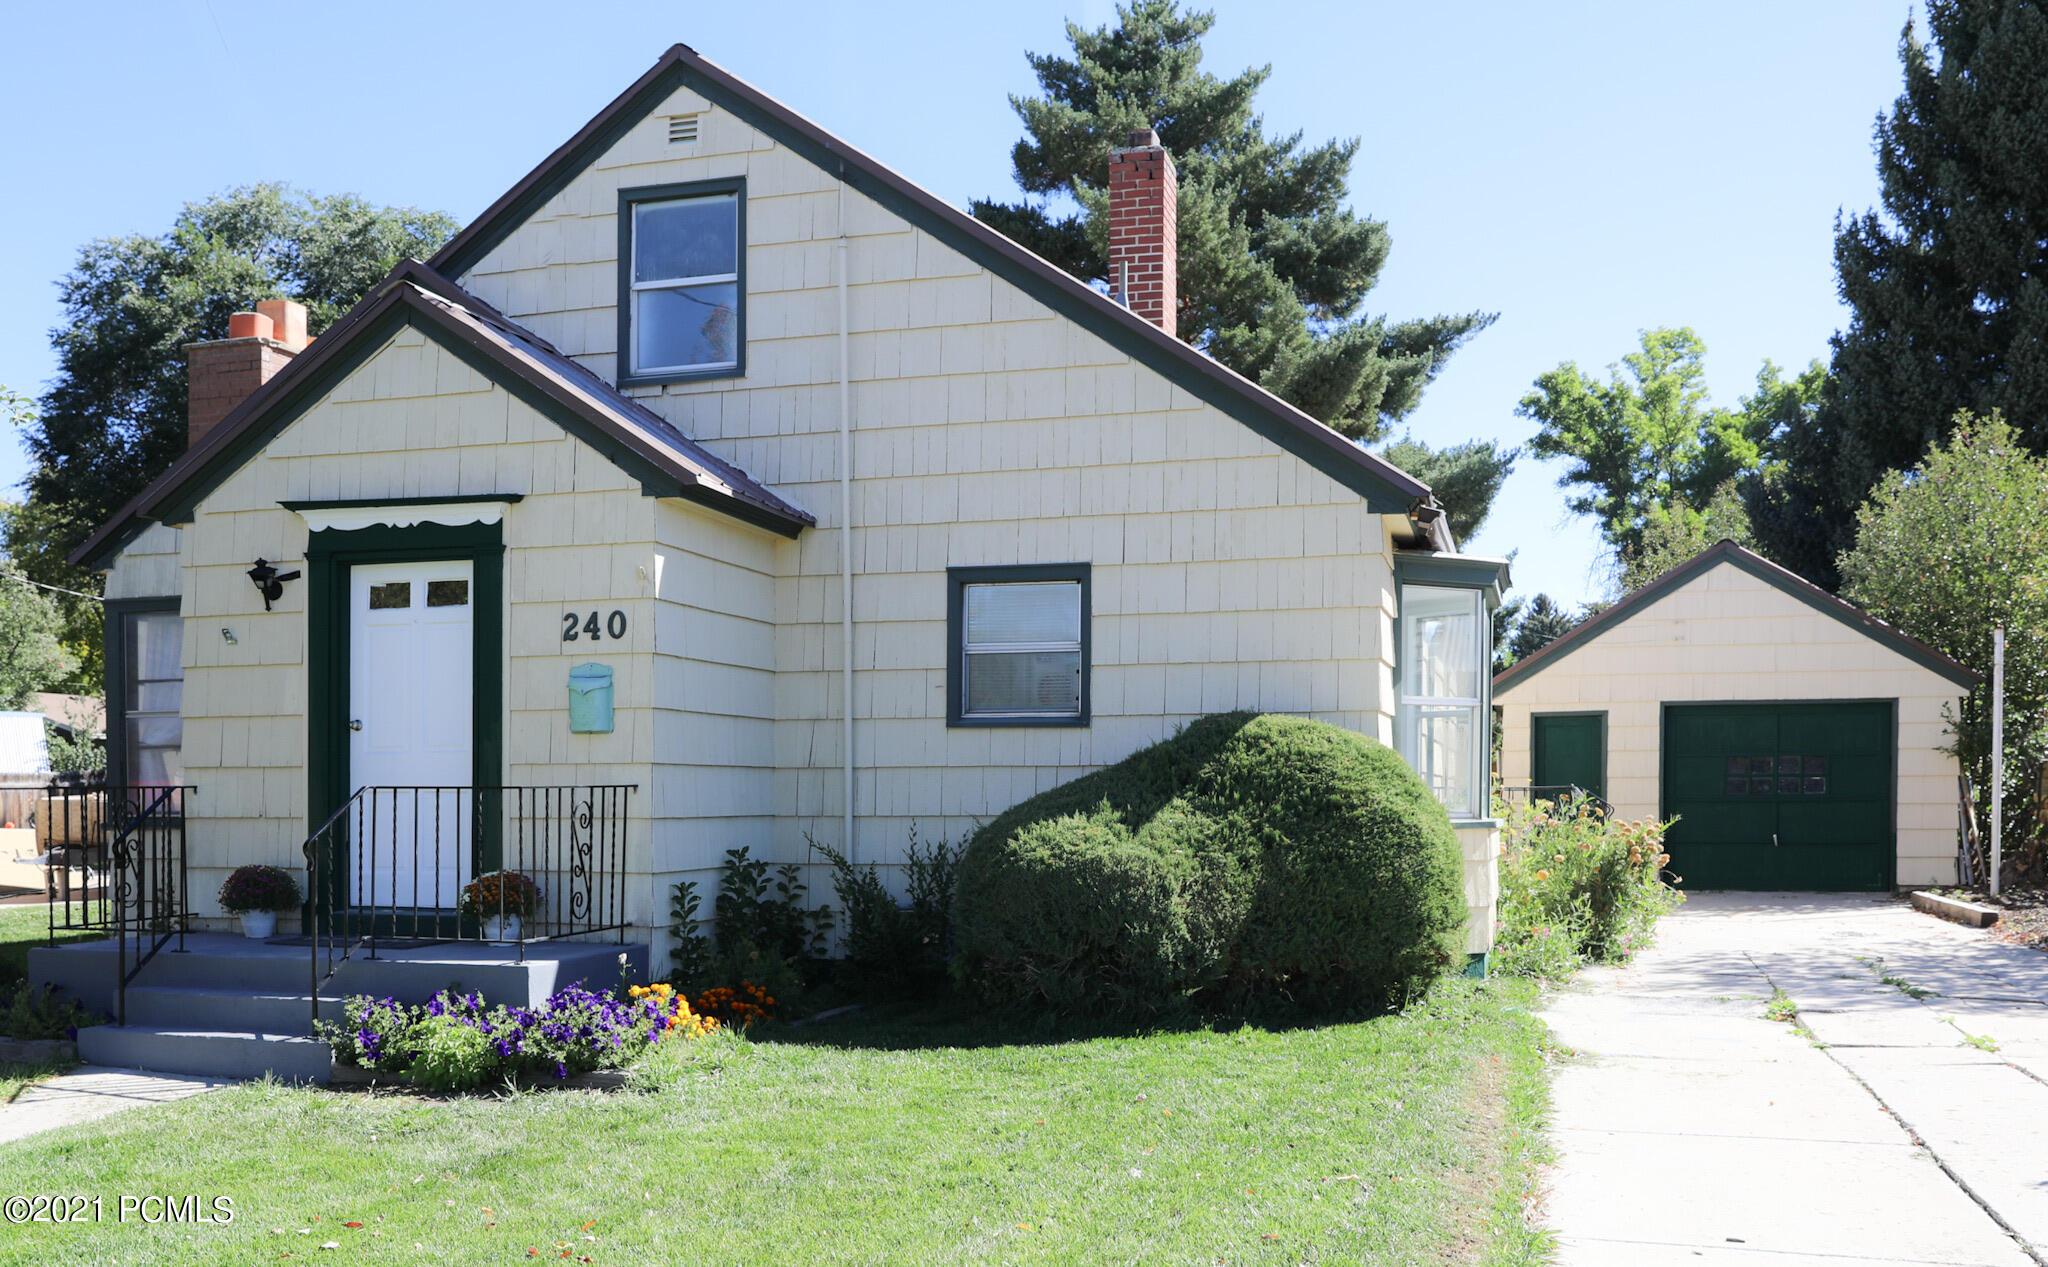 240 200, Heber City, Utah 84032, 3 Bedrooms Bedrooms, ,1 BathroomBathrooms,Single Family,For Sale,200,12103857